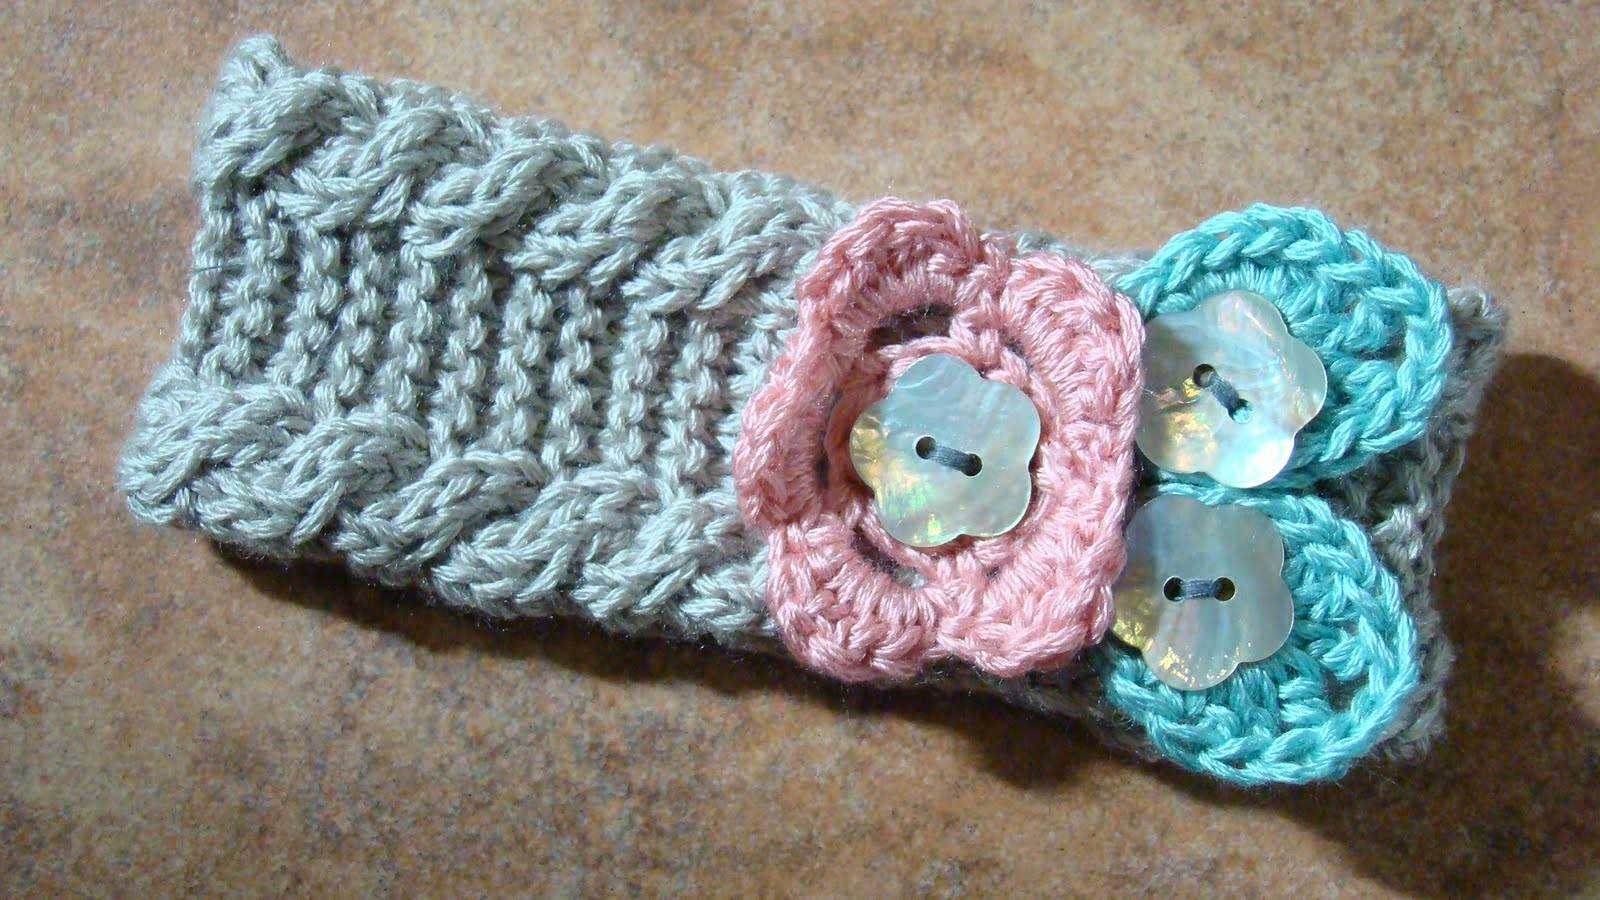 Crafts By Starlight: Knit Infant Winter Headband